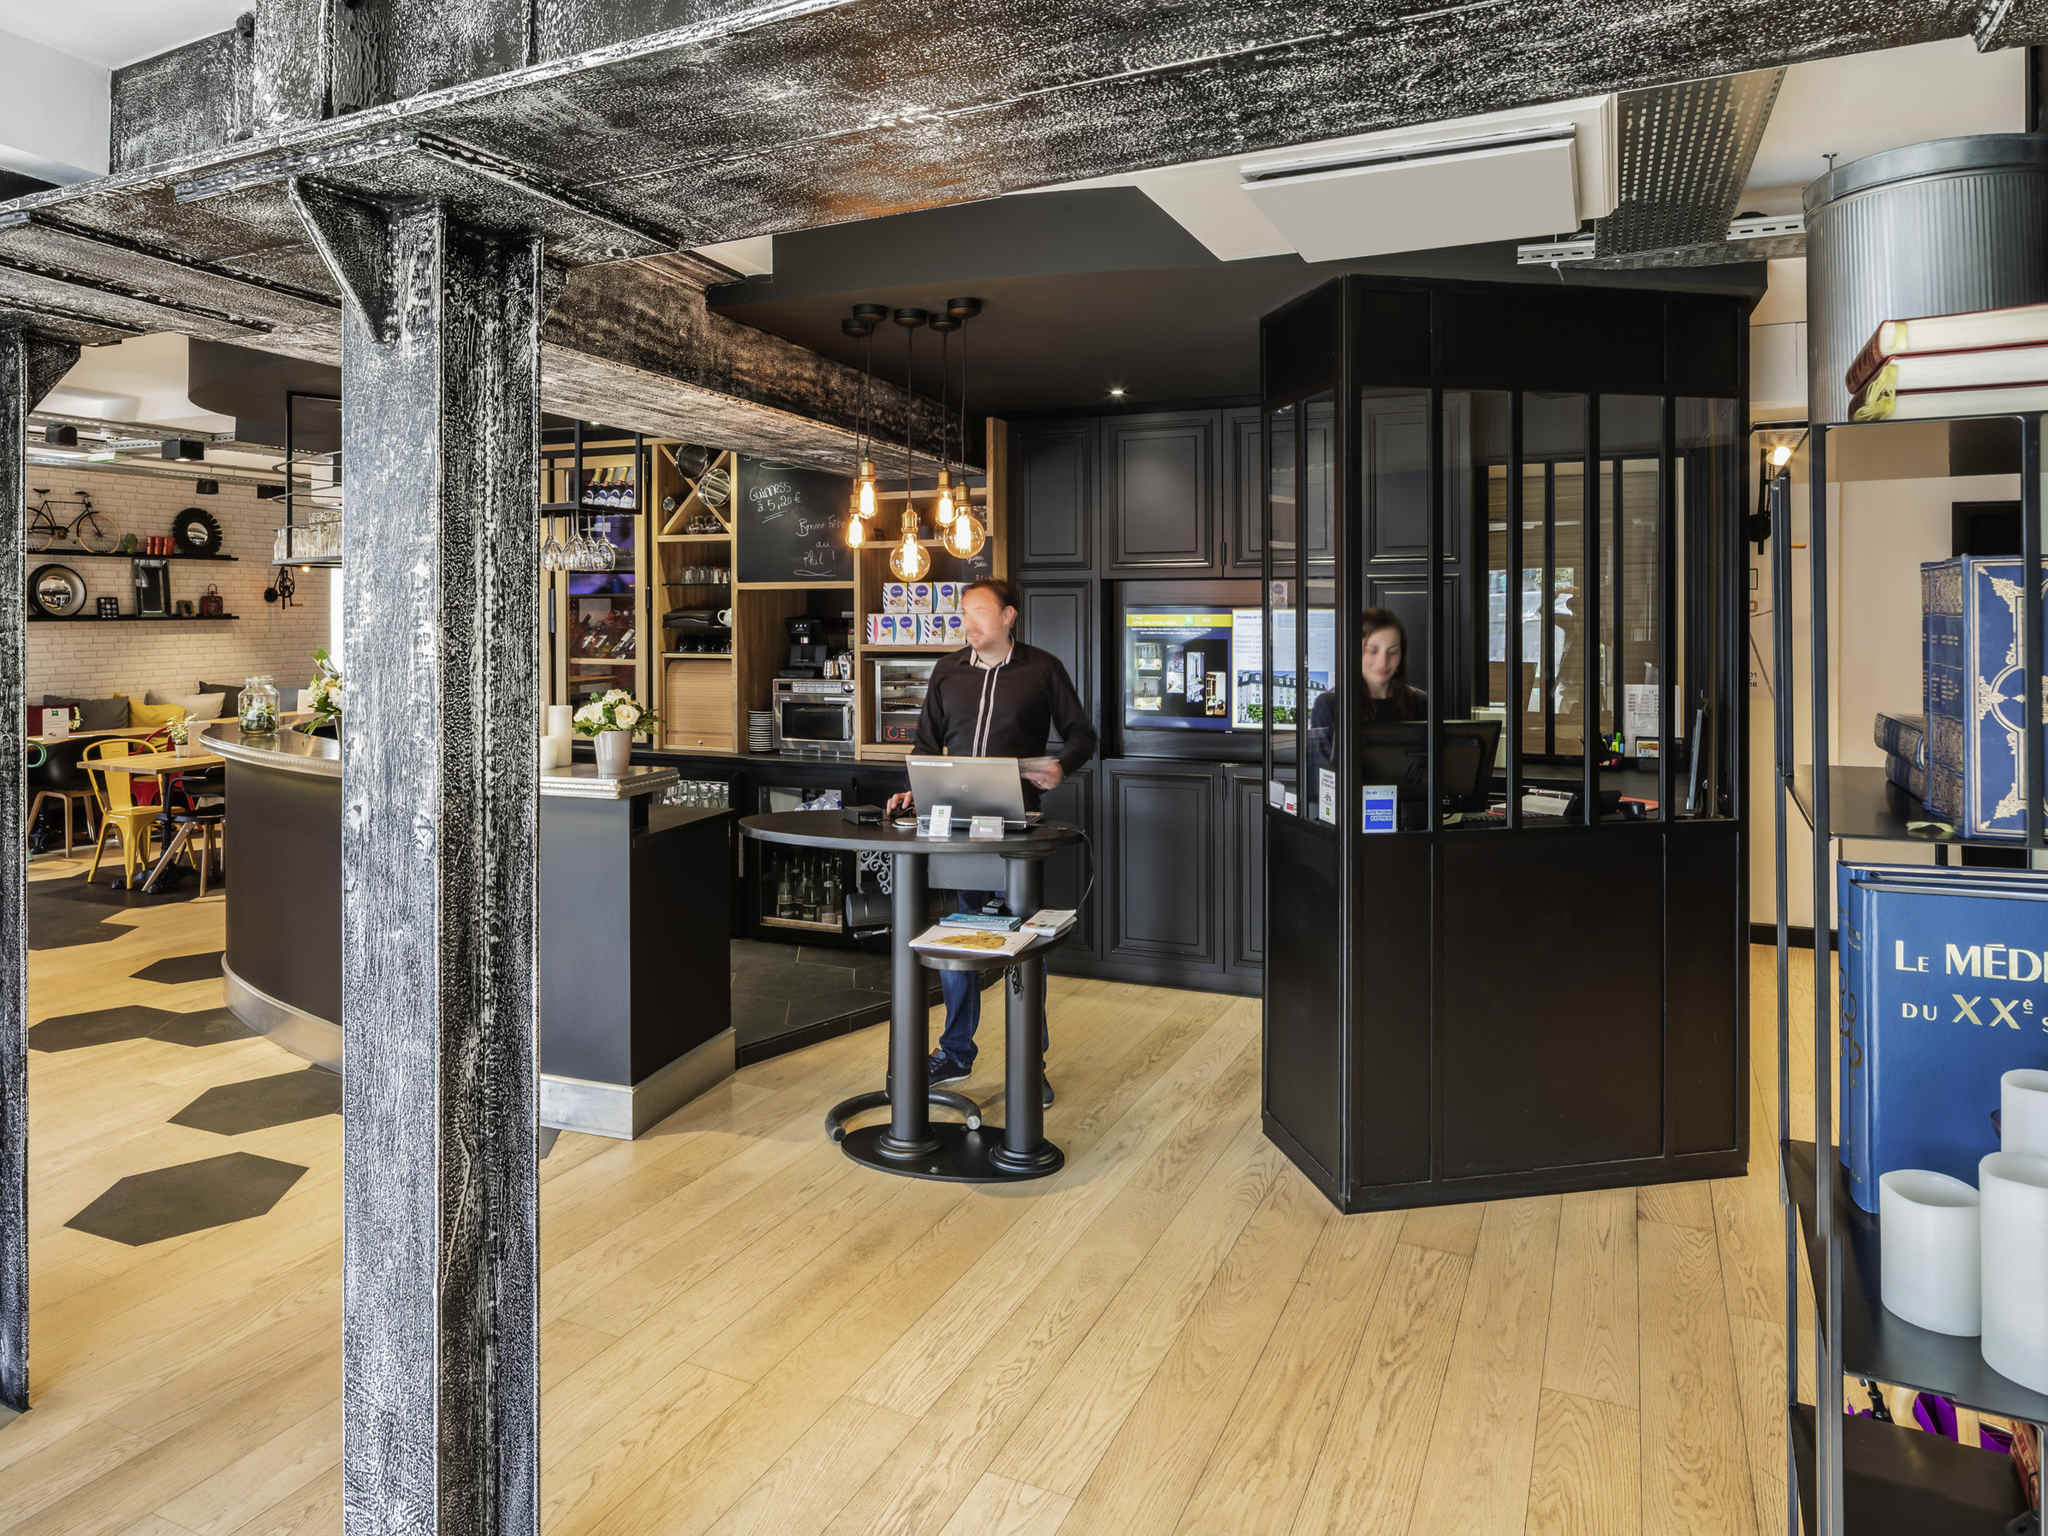 Hotel - ibis Styles Dinan Centre-Ville